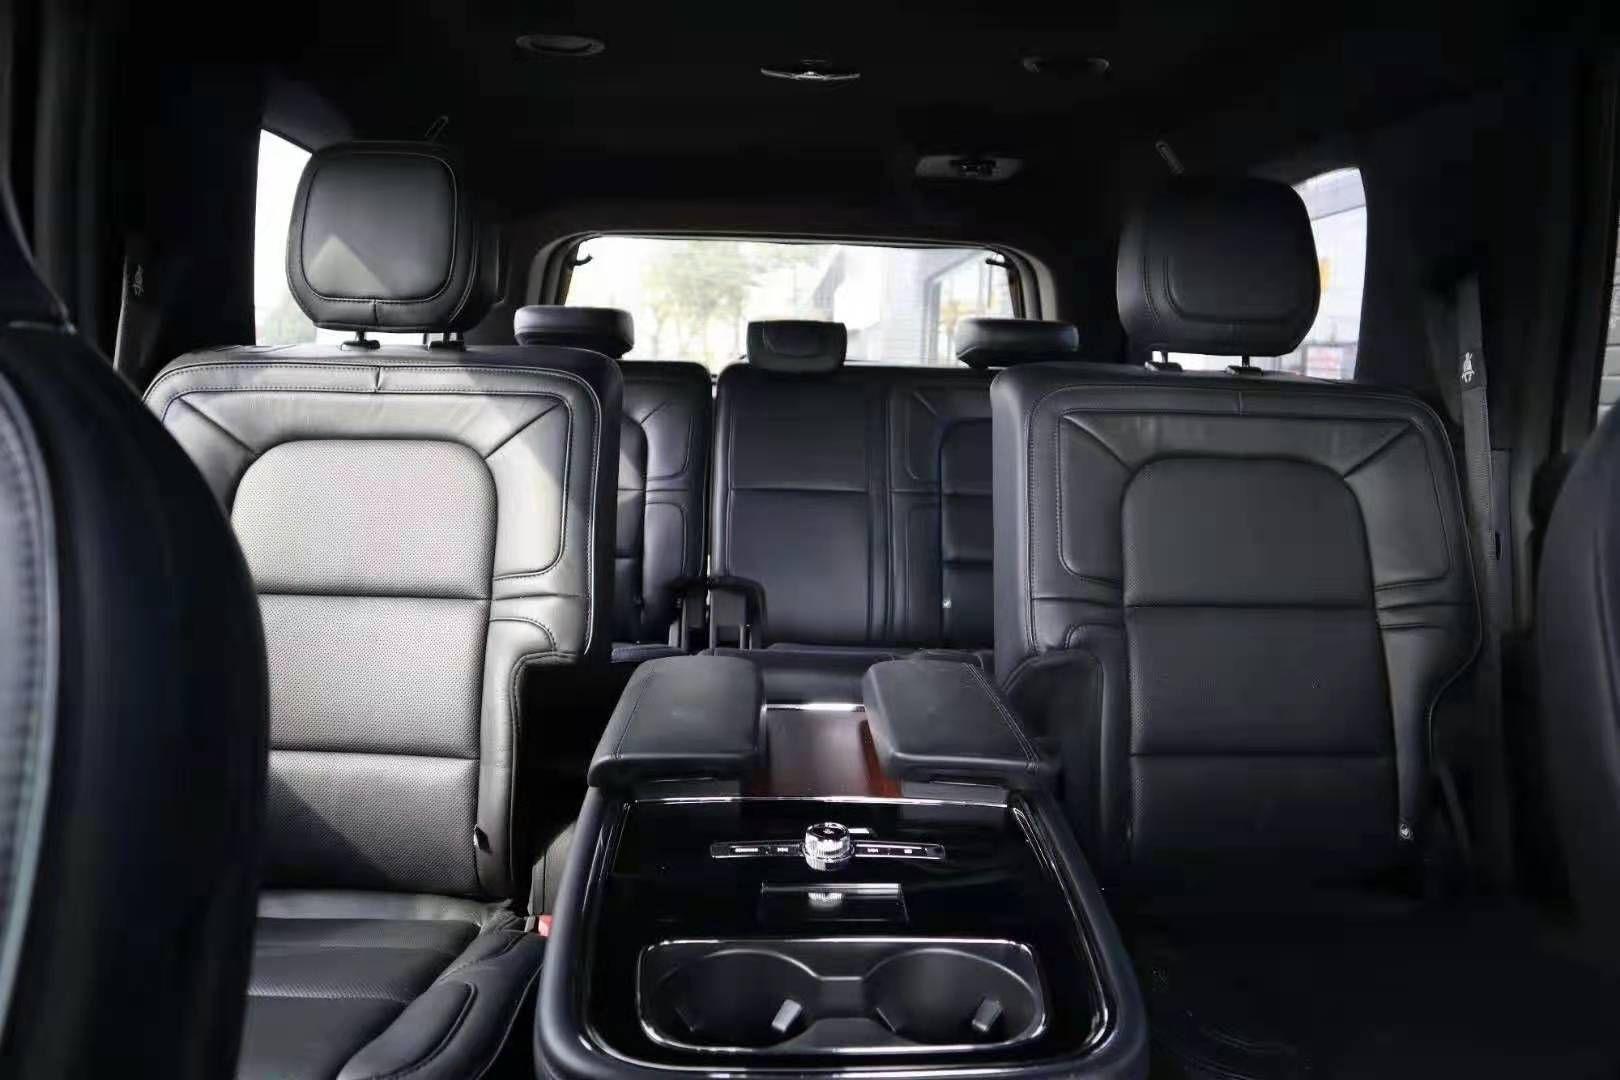 2019 Lincoln Navigator L  LINCOLN NAVIGATOR L RESERVE - INFOCAR - Toronto's Most Comprehensive New and Used Auto Trading Platform